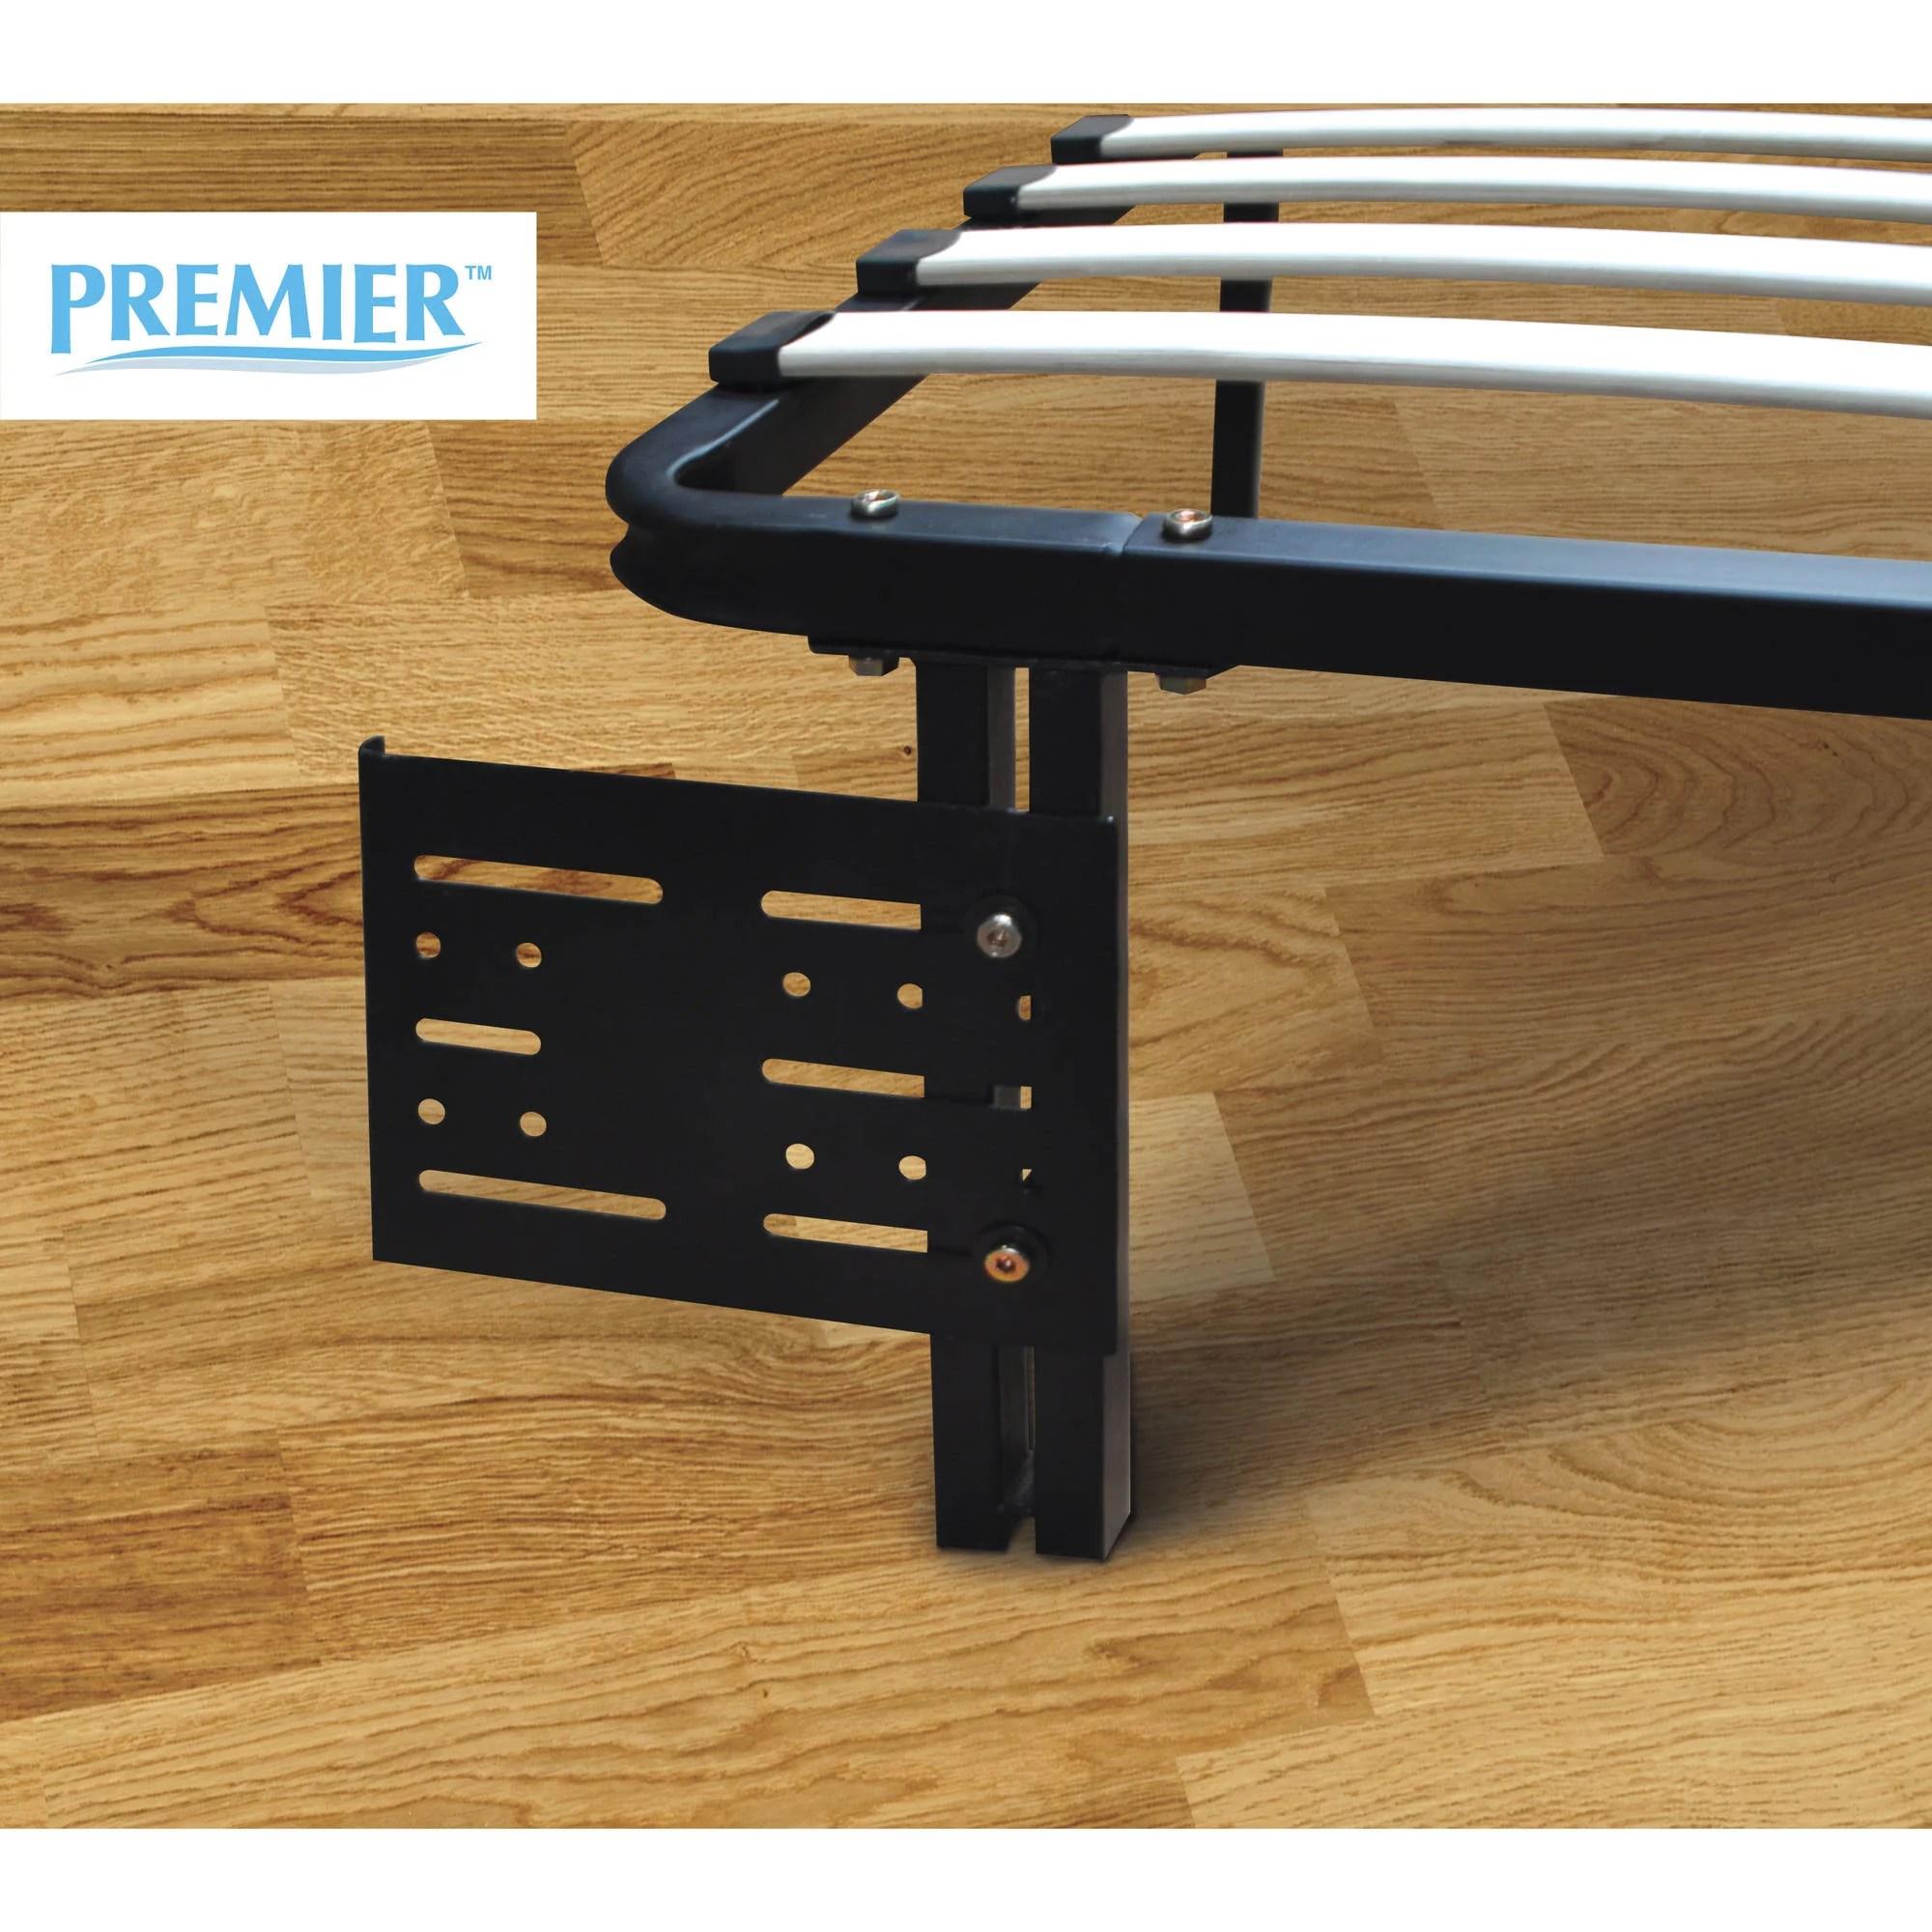 Premier Flex HeadboardFootboard Brackets Black